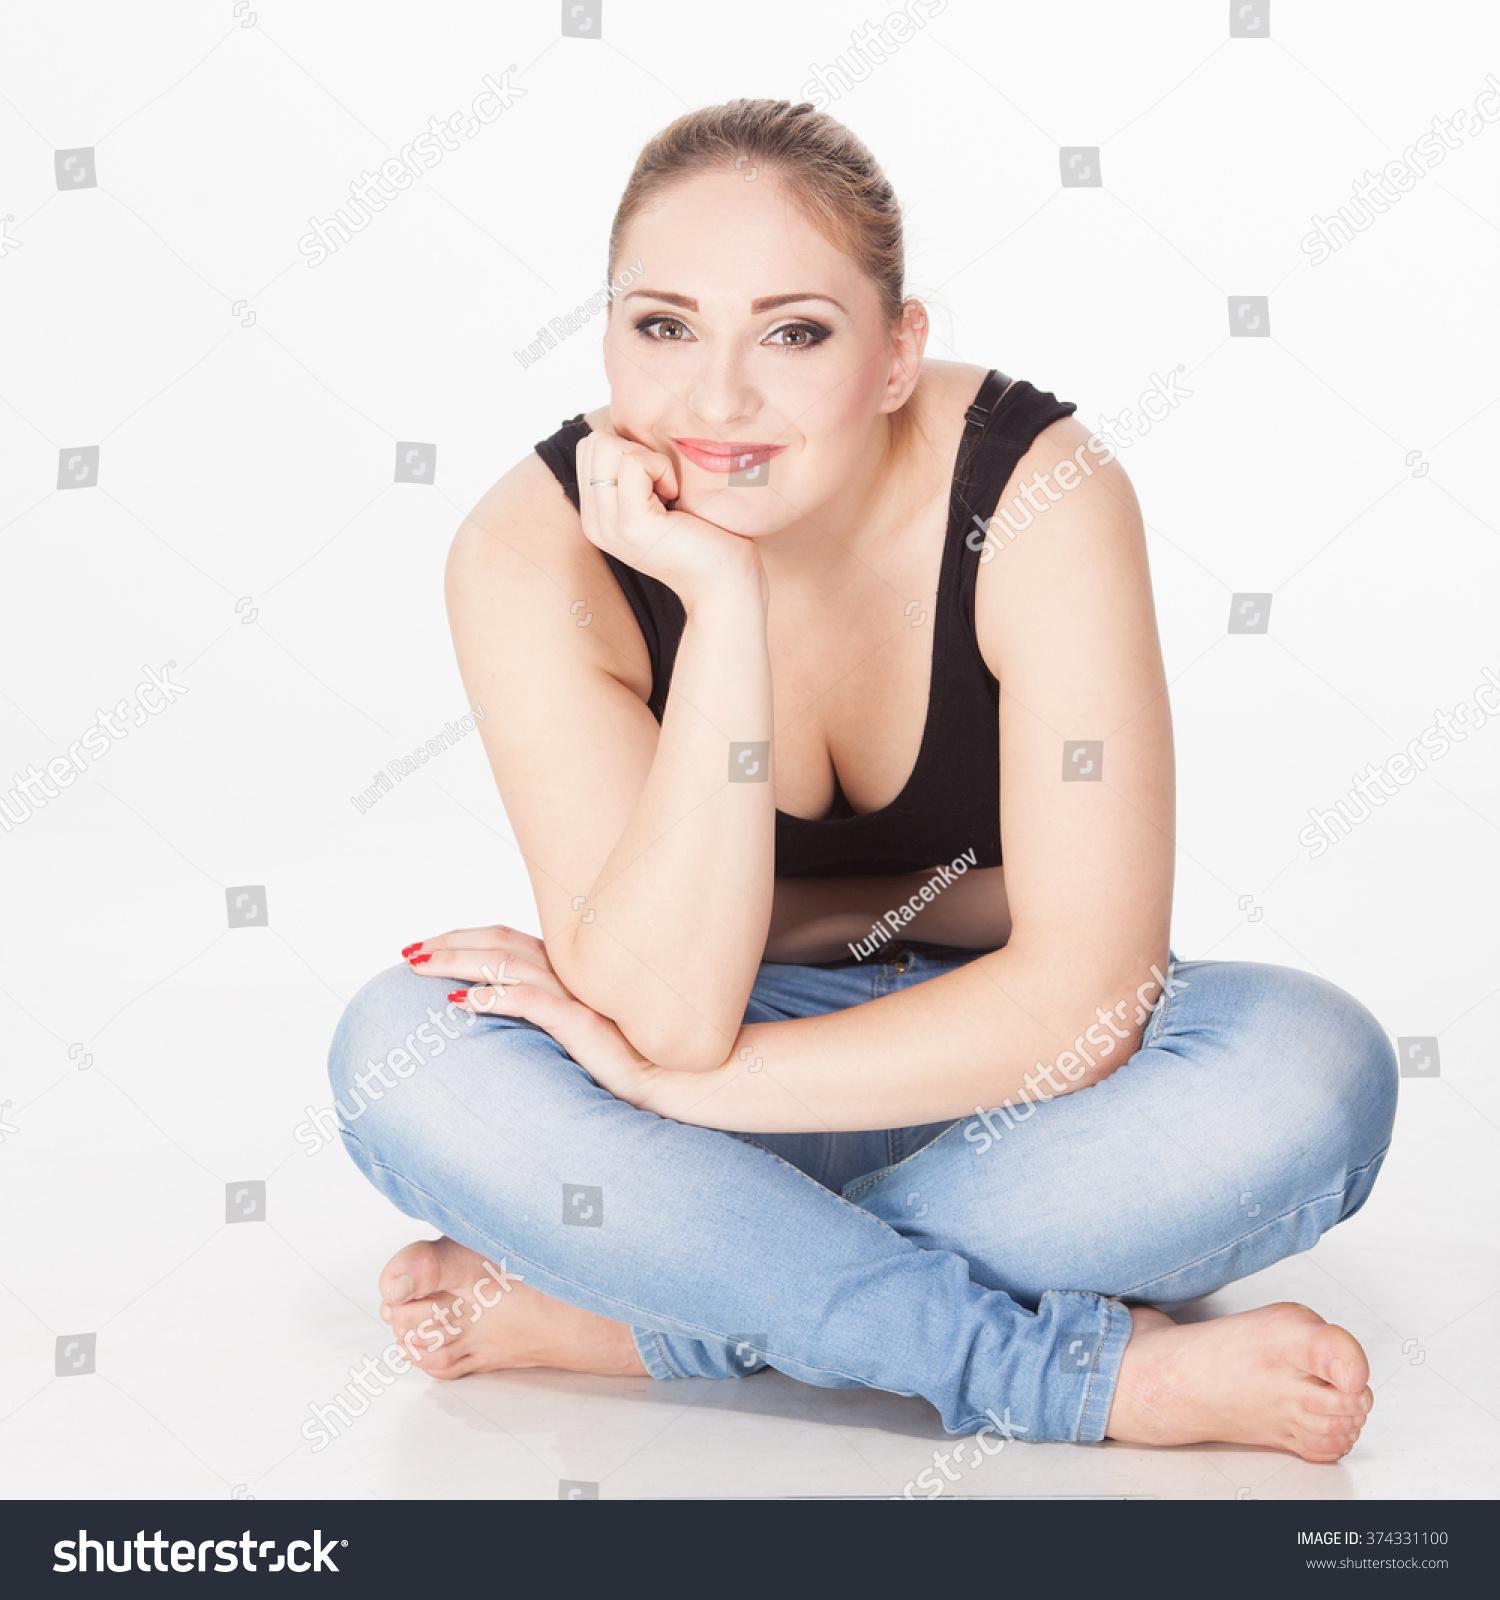 Fat Girl Cake Sitting - Hot Porno-9797